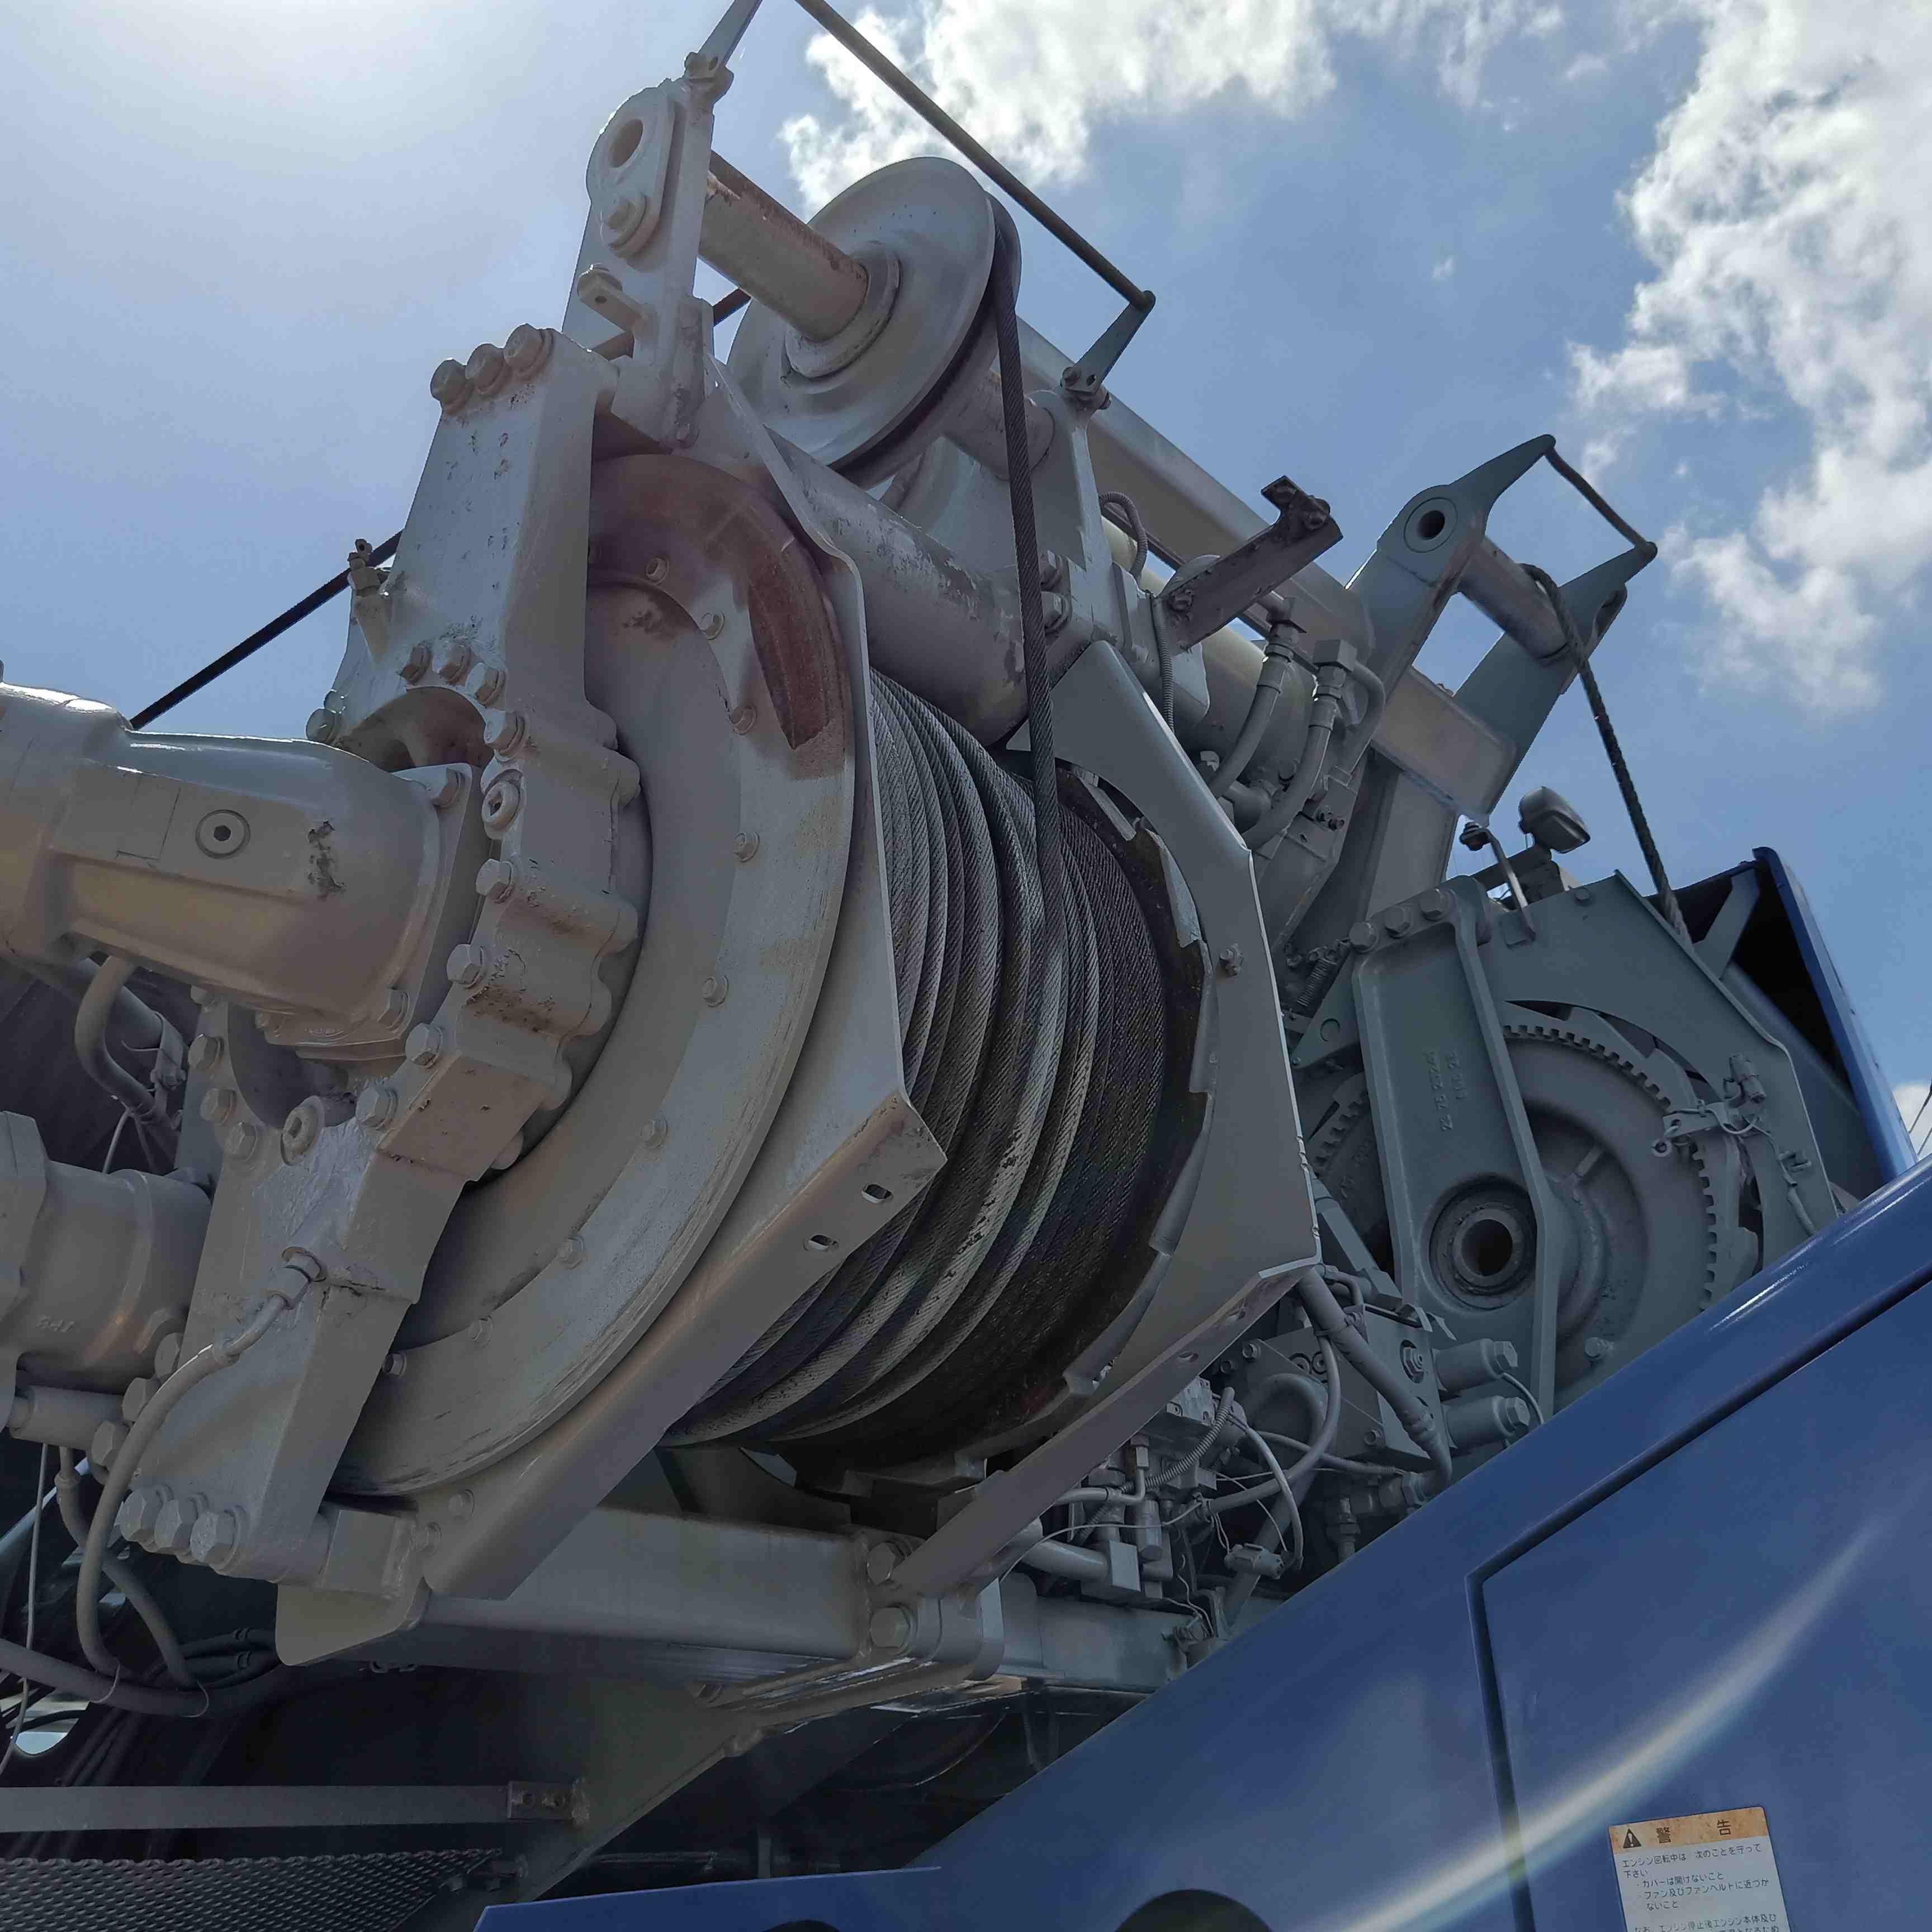 Used Komatsu 50 Ton Truck Crane In Good Working Condition